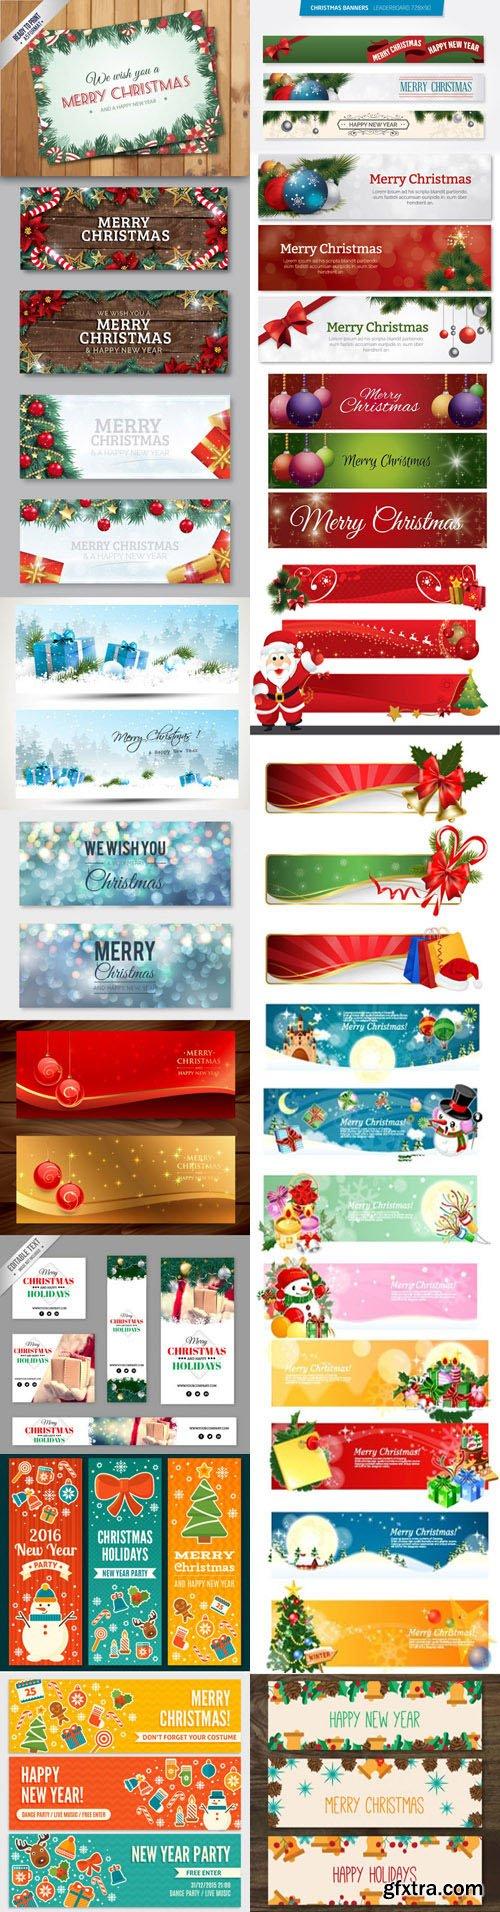 Christmas Banners Vector Collection 1 [Ai/EPS]